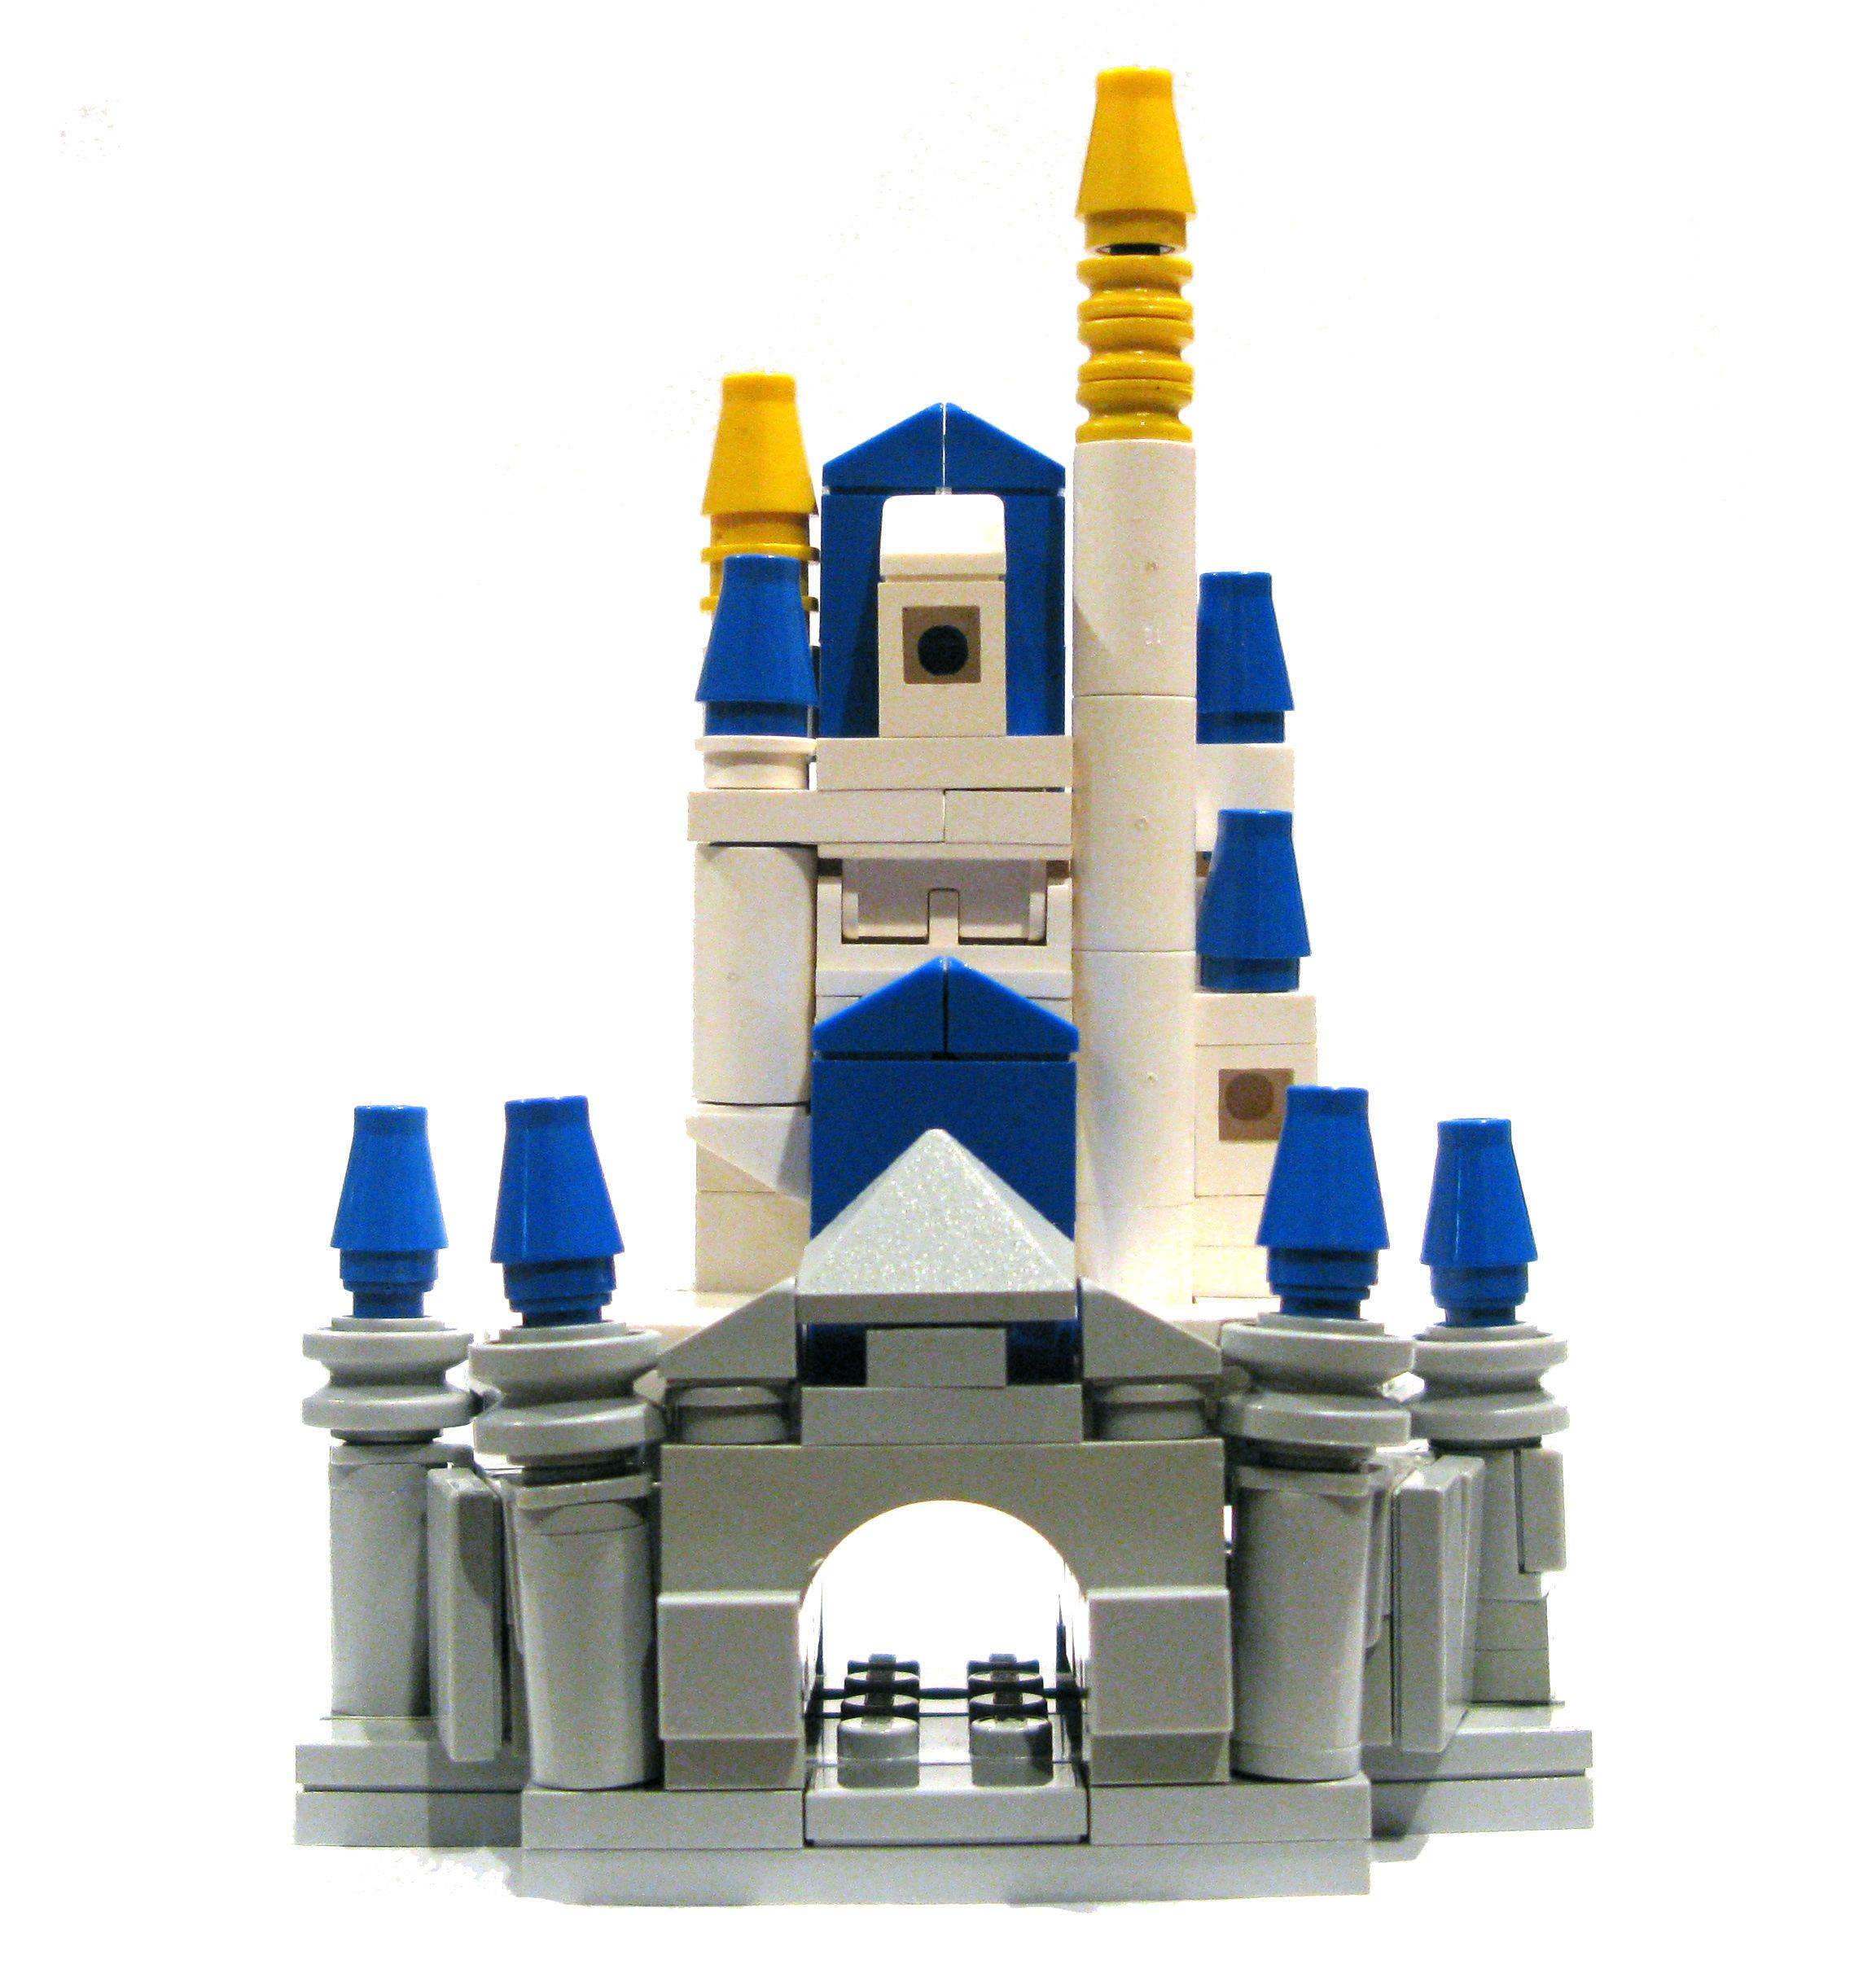 LEGO Micro-Scale Cinderella Castle MOC   LEGO! LEGO! LEGO ...